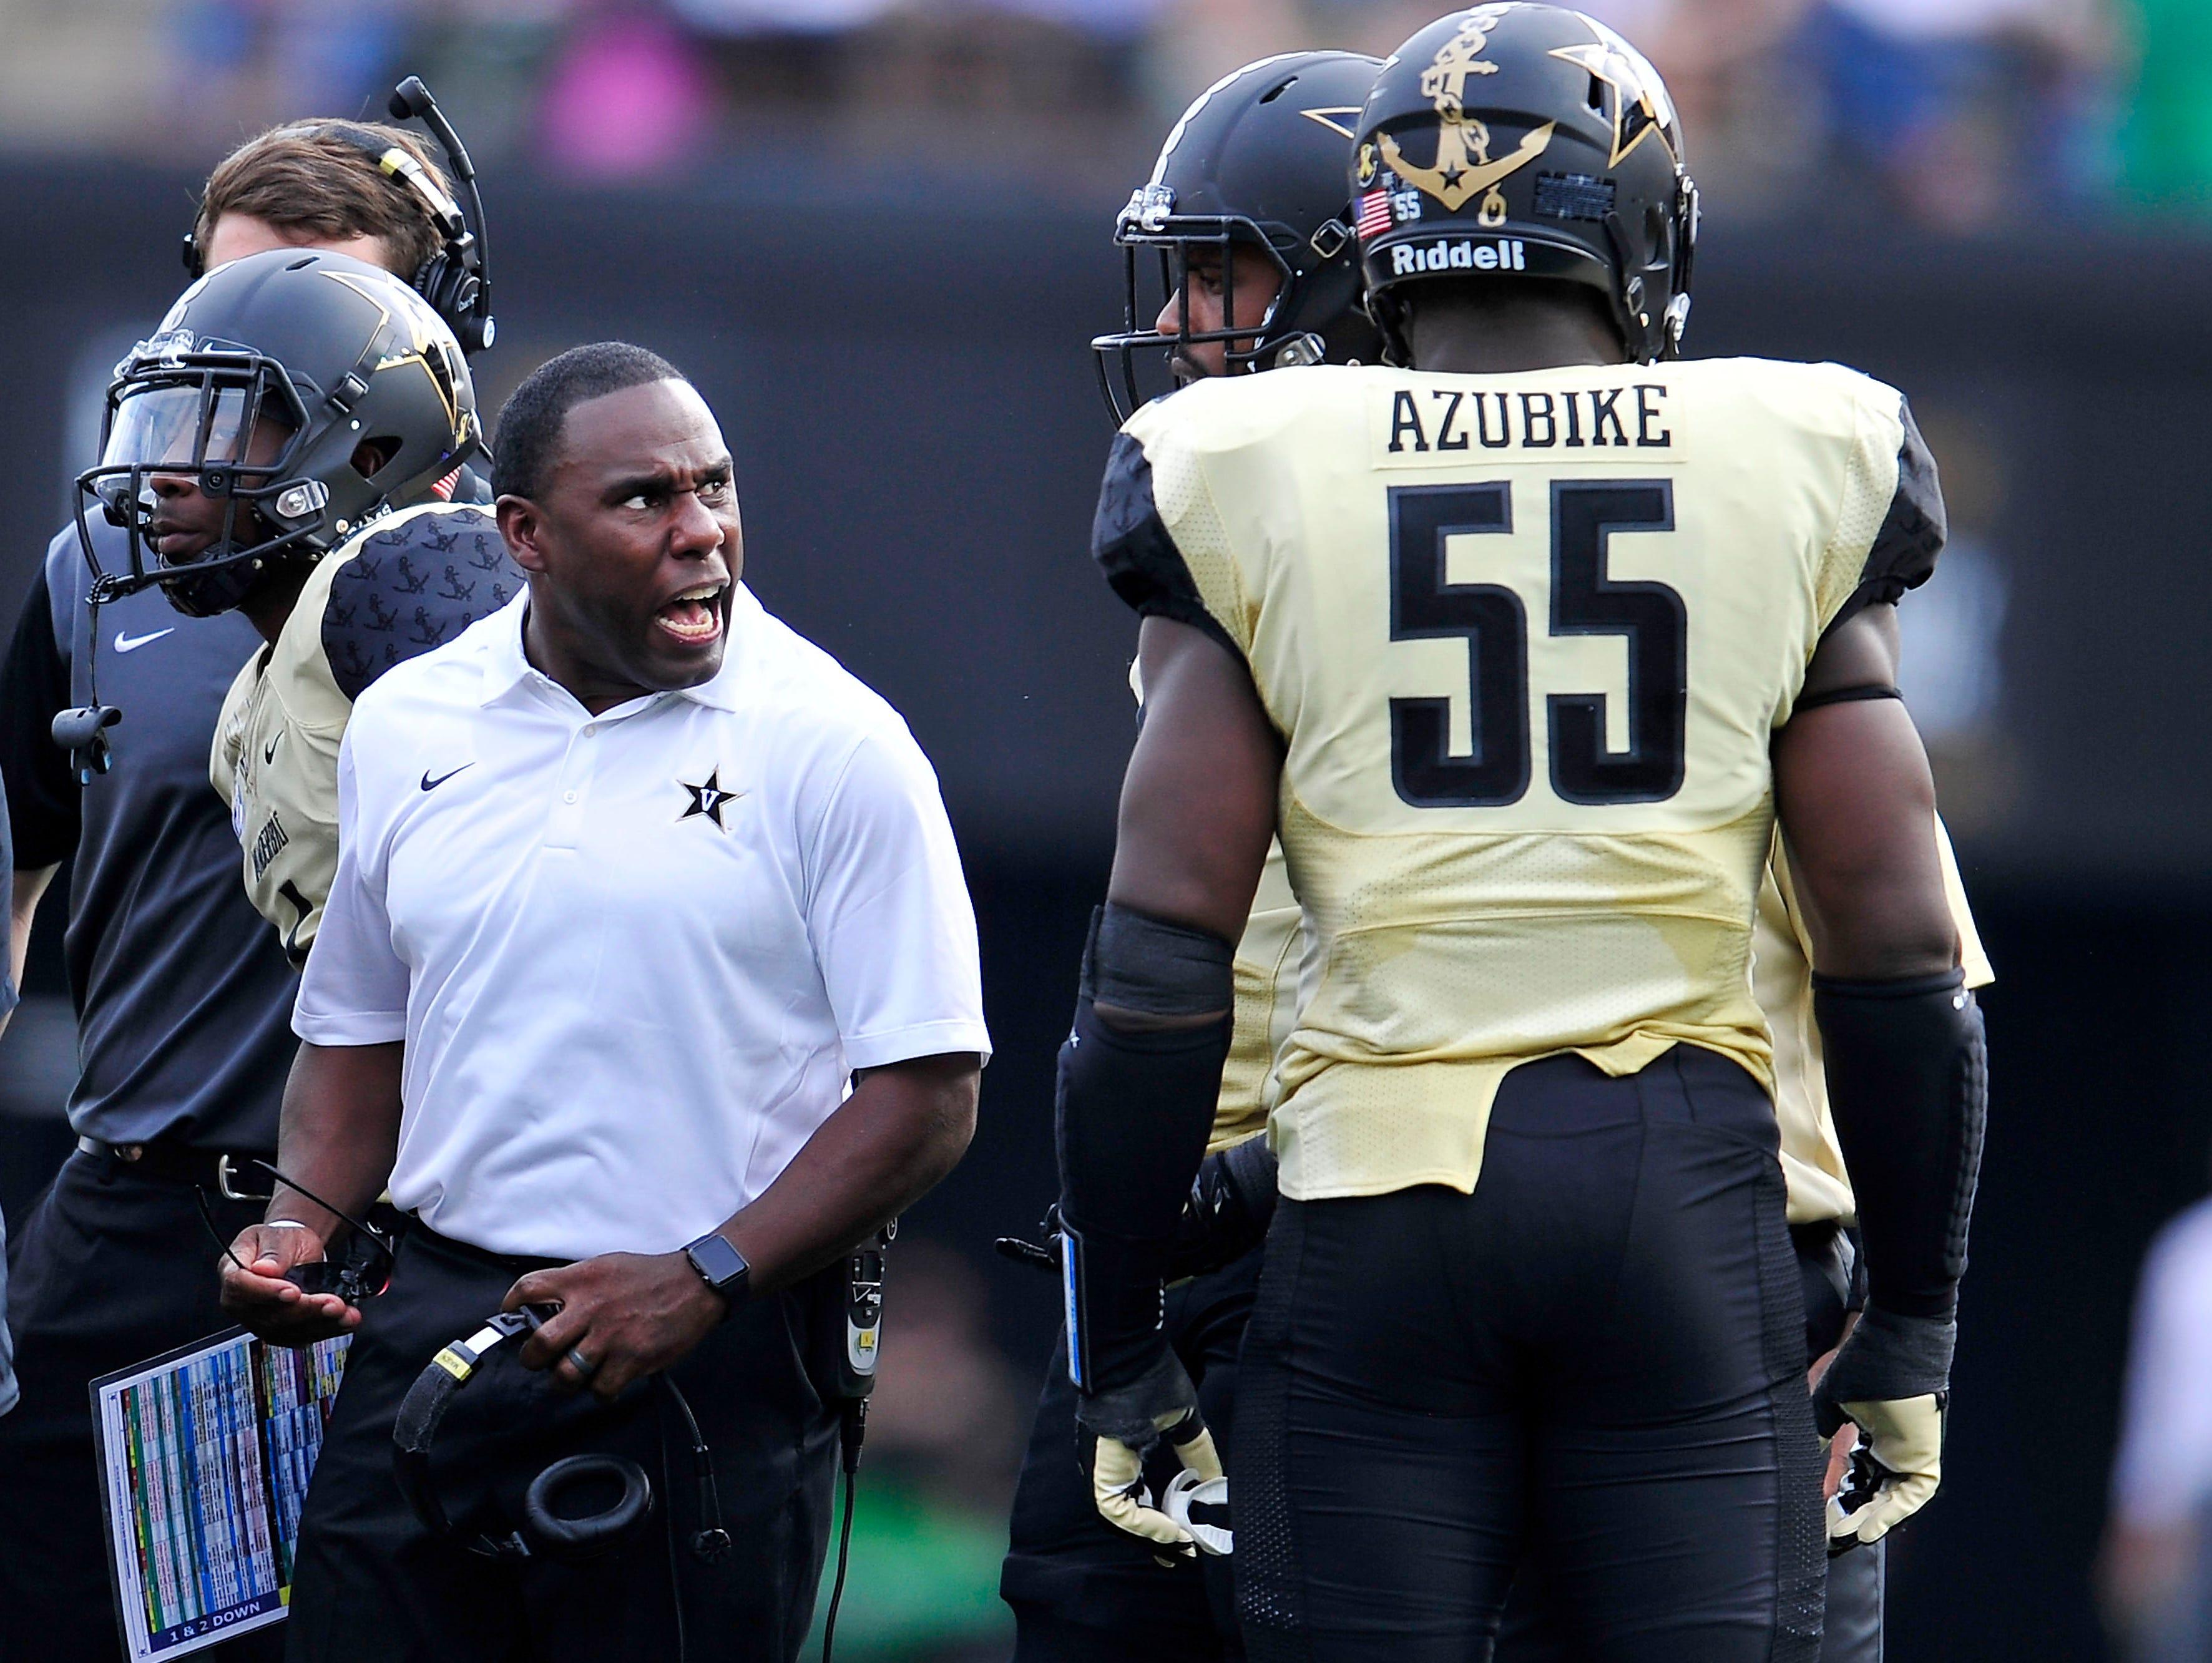 Vanderbilt coach Derek Mason, left, defensive end Caleb Azubike (55) and the Commodores will face MTSU on Saturday.